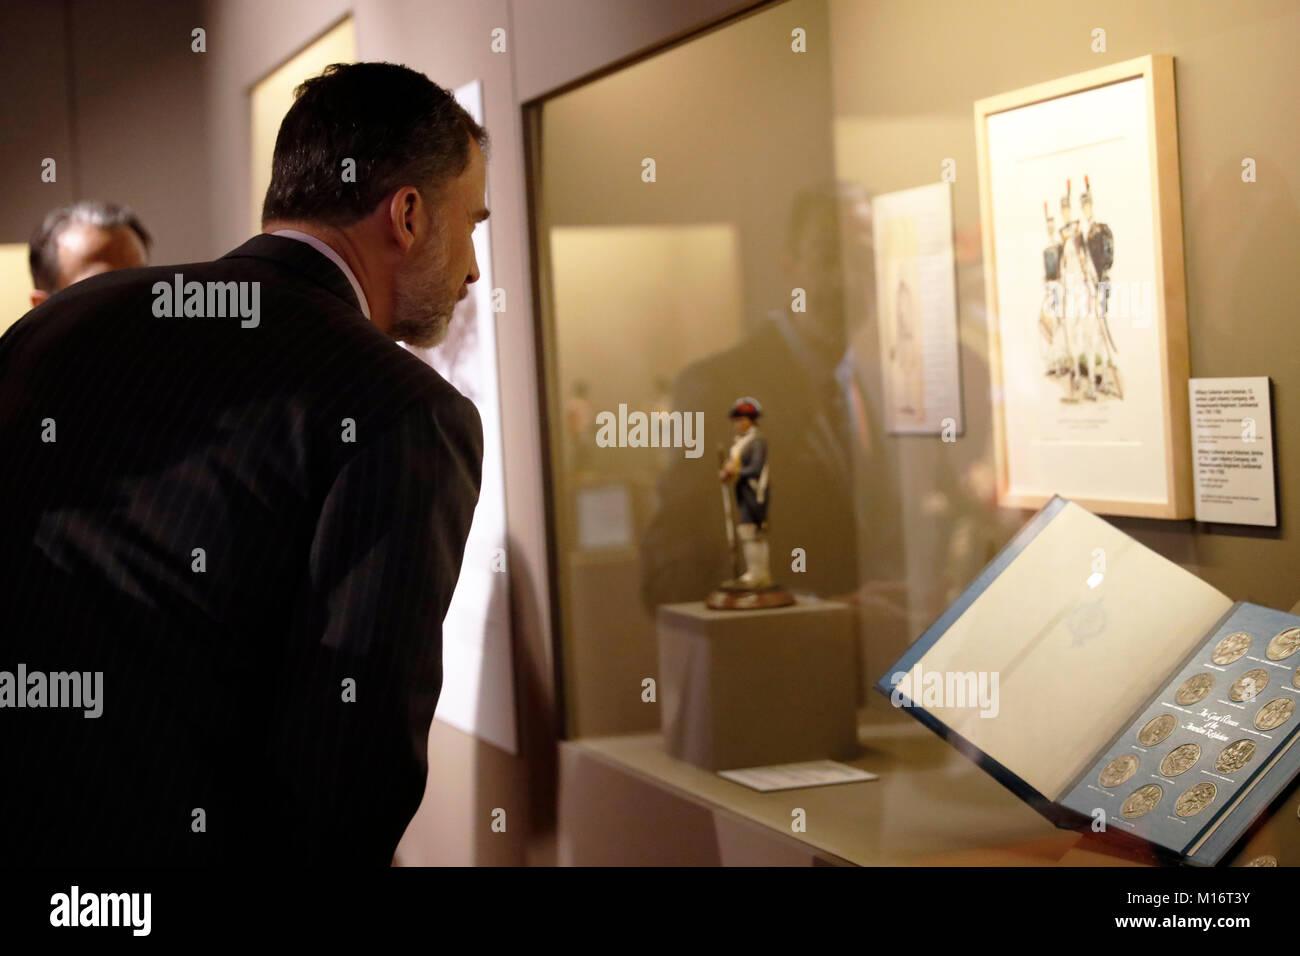 Roi d'Espagne Felipe VI Visites exhibicion ' La memoria recobrada. Revêtement en la historia de Etats Photo Stock